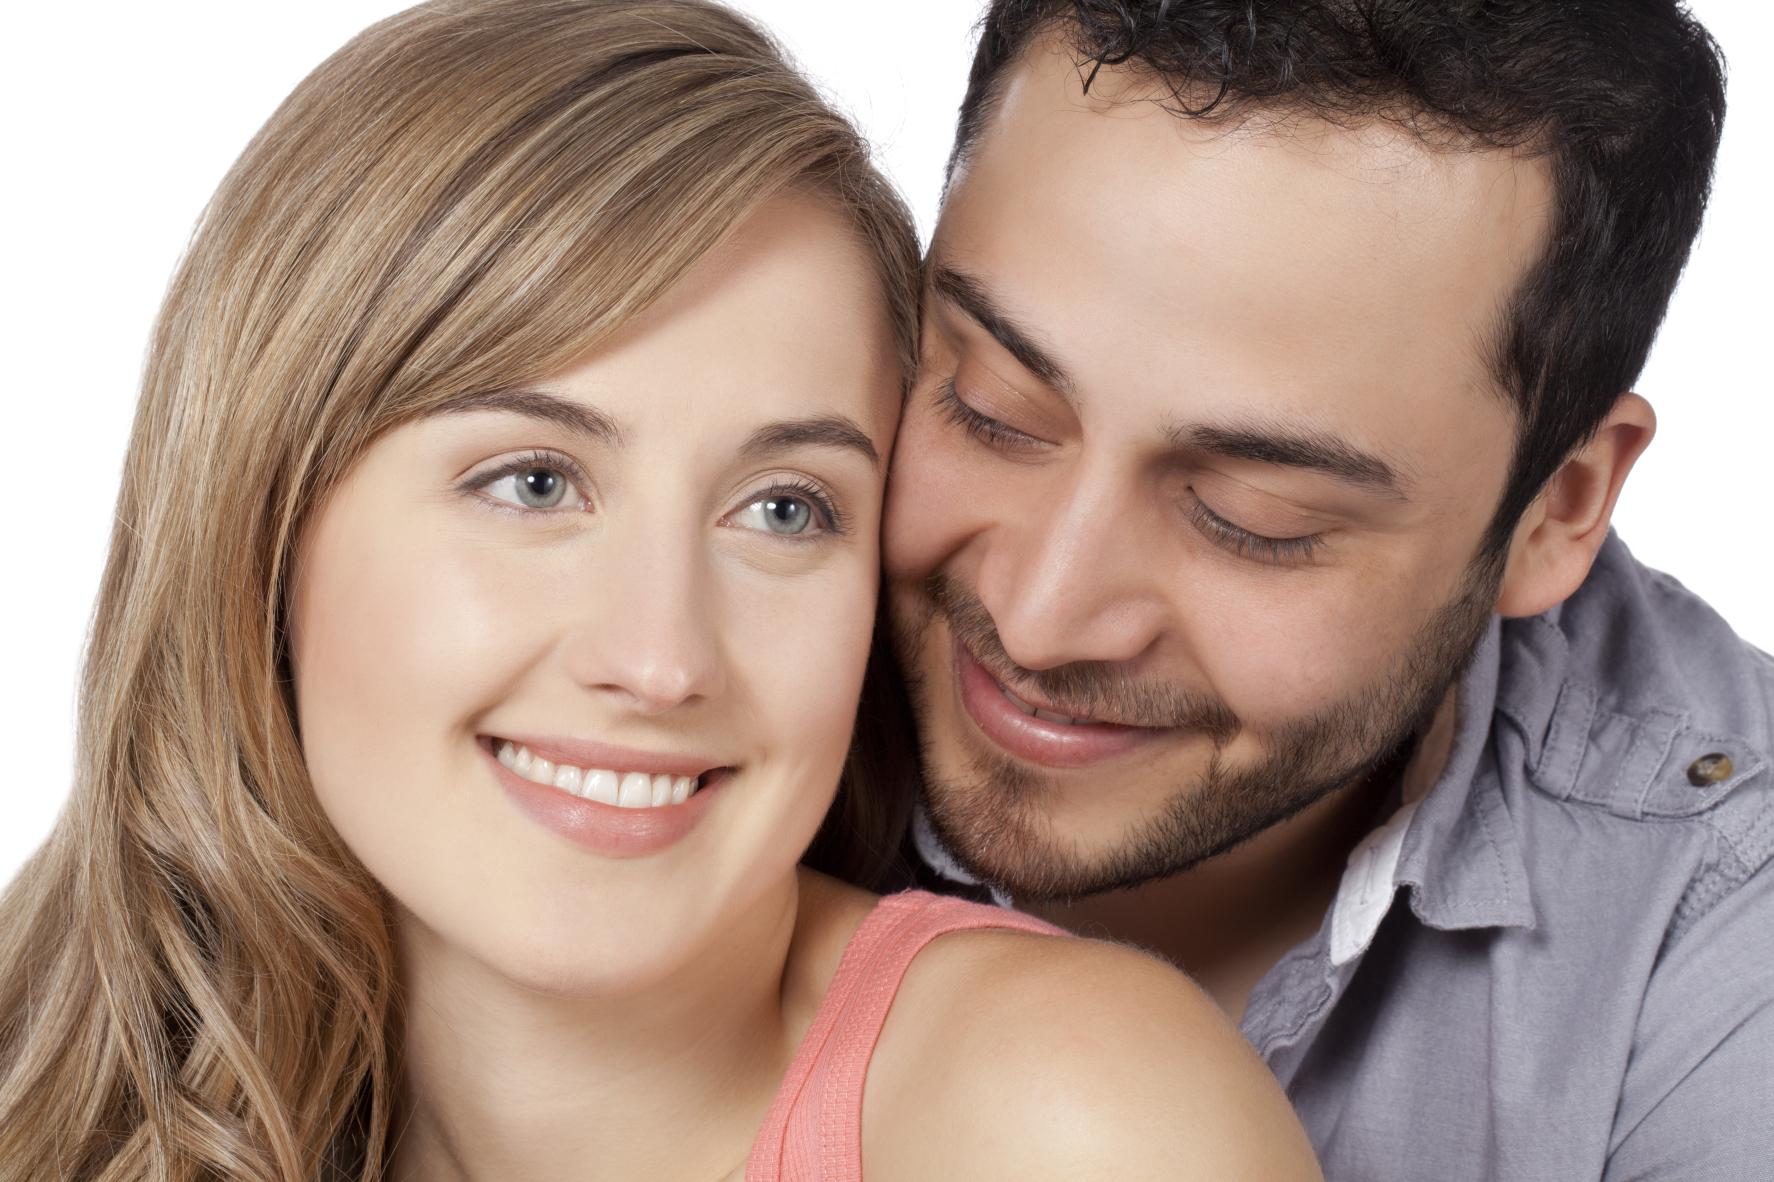 pastors-dating-website-laura-lane-nude-pic